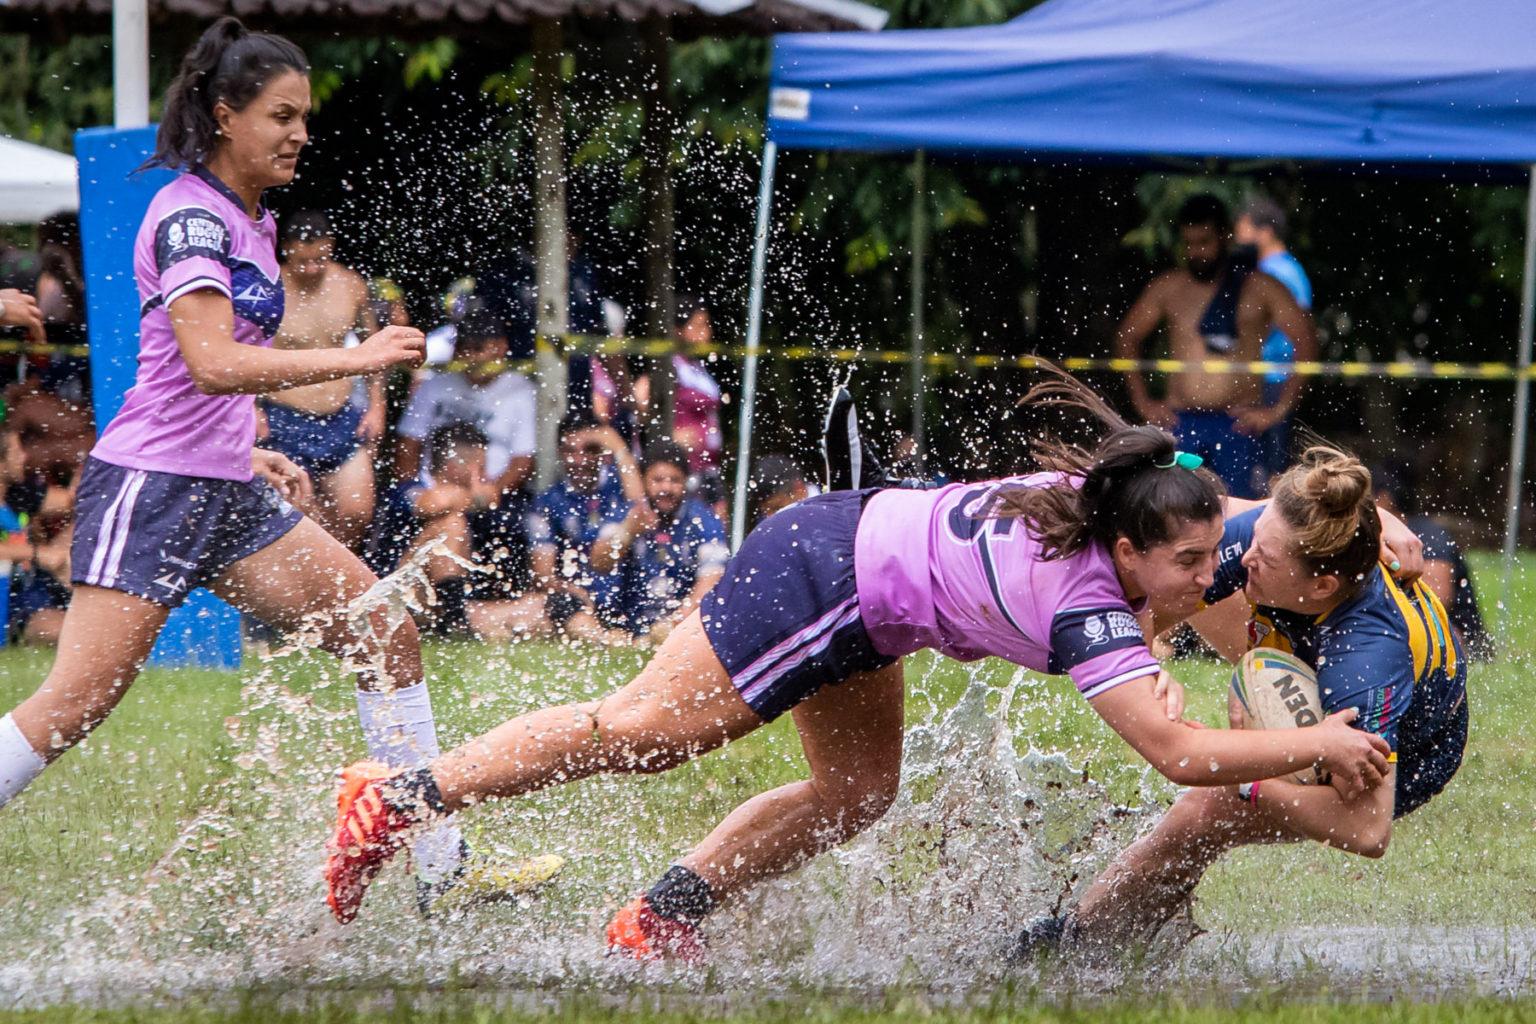 Melina, Maringa and Vitória qualify for Brazilian Women's Semi Finals